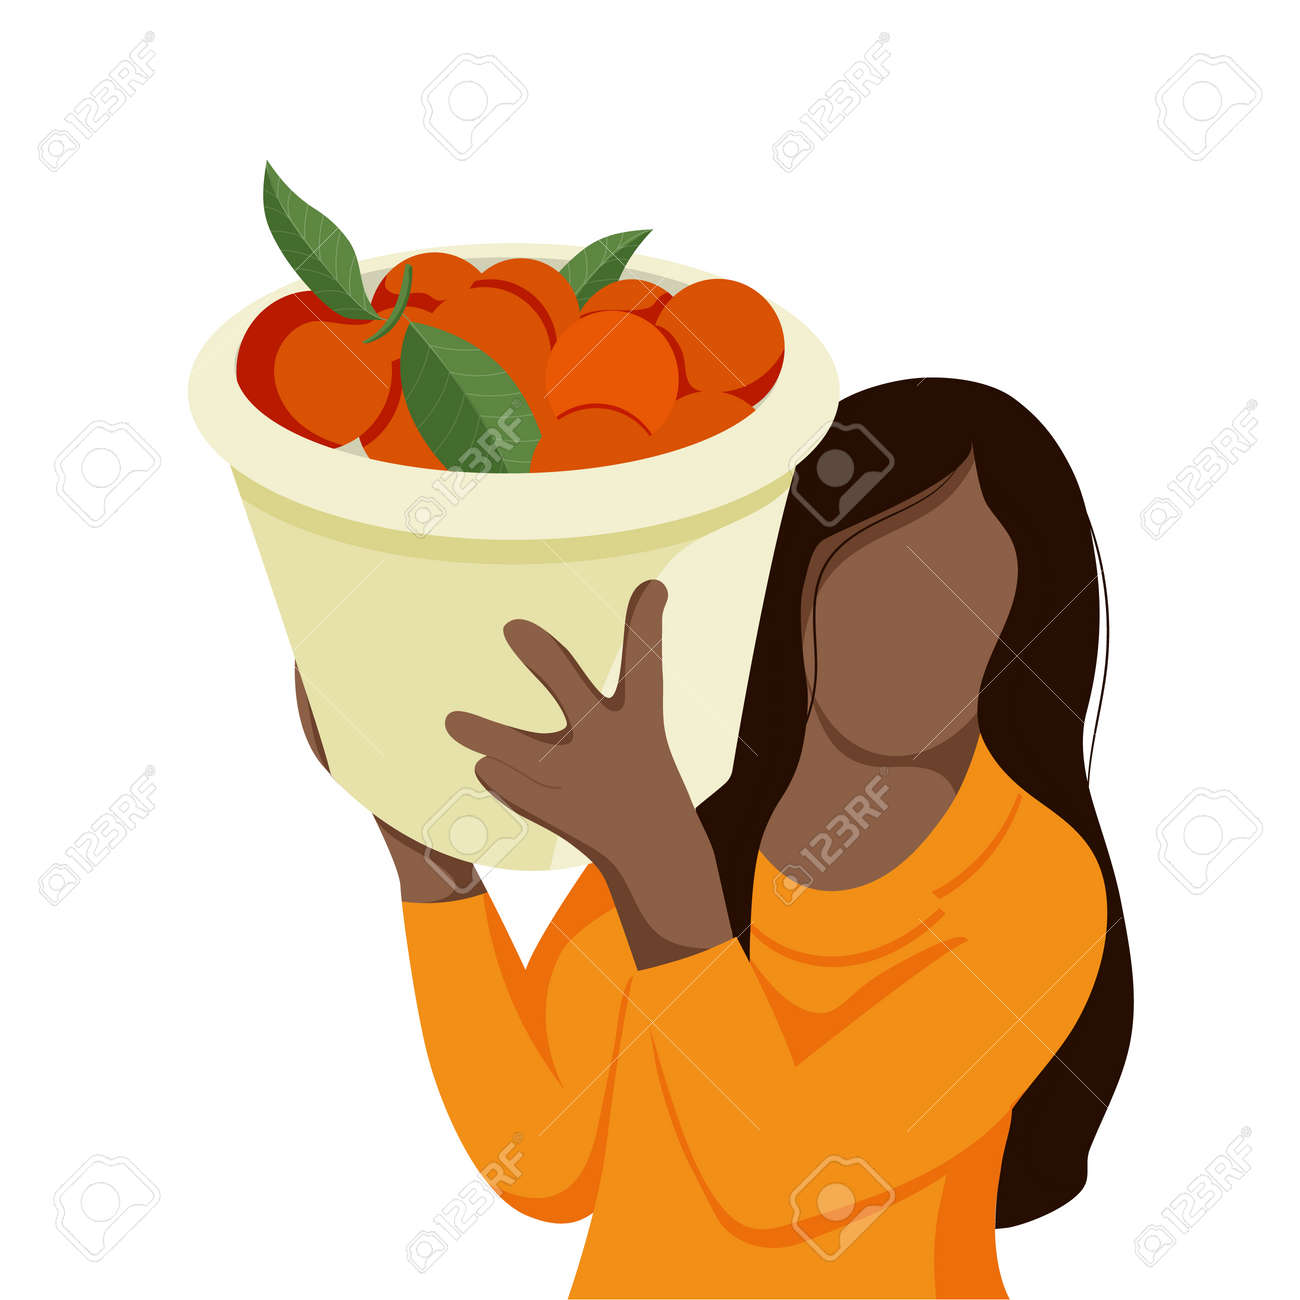 Workers Pick Orange In Plantation - 169605812